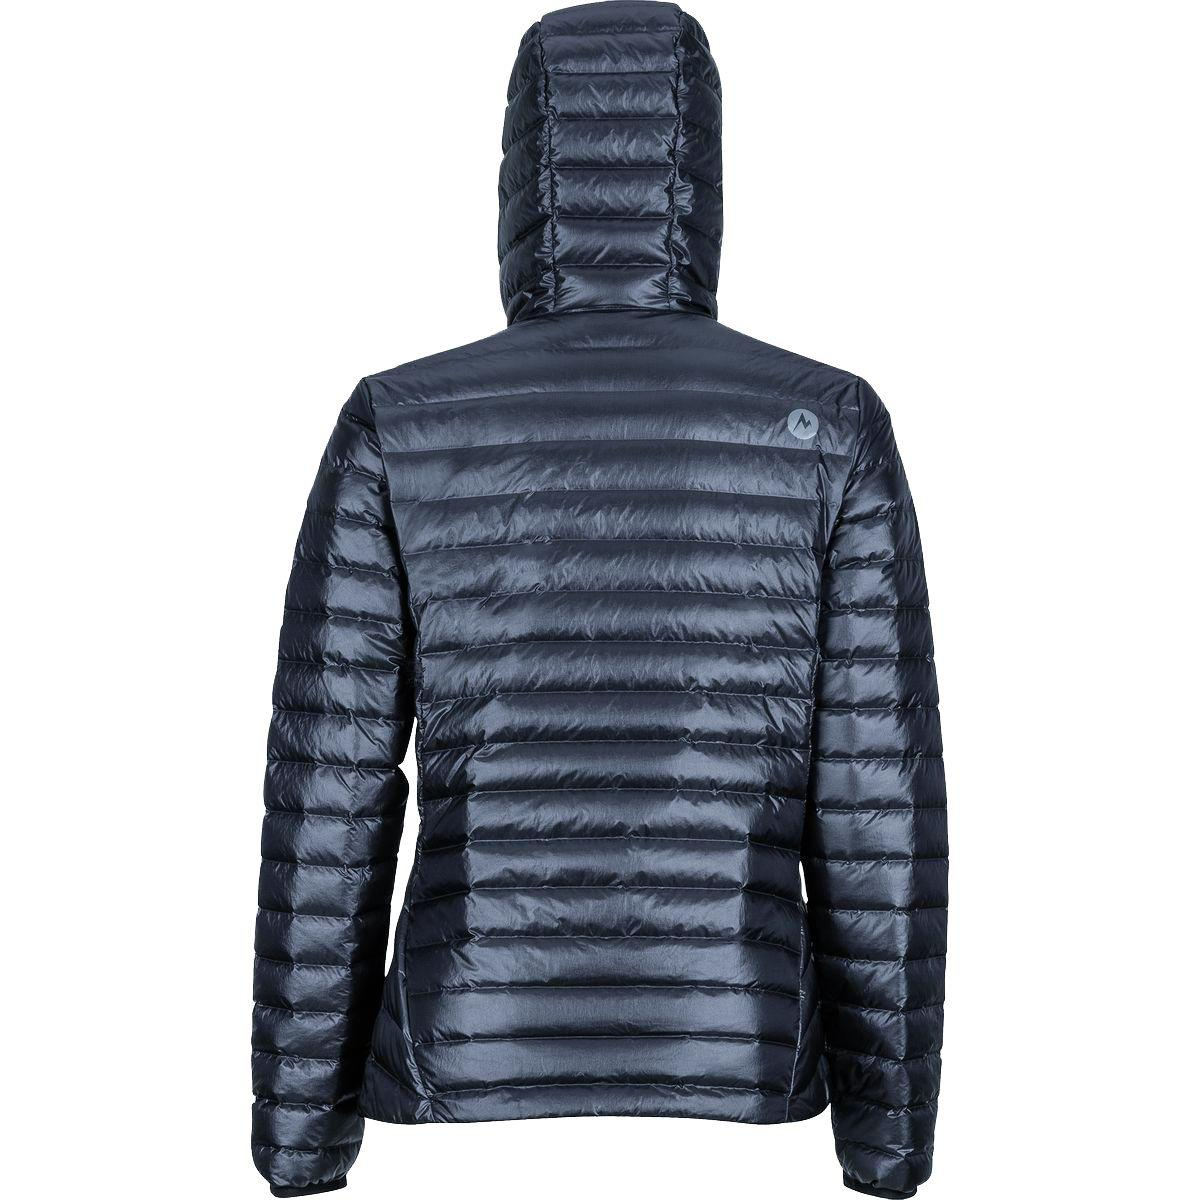 Marmot Synthetic Quasar Nova Hooded Down Jacket in Black ...